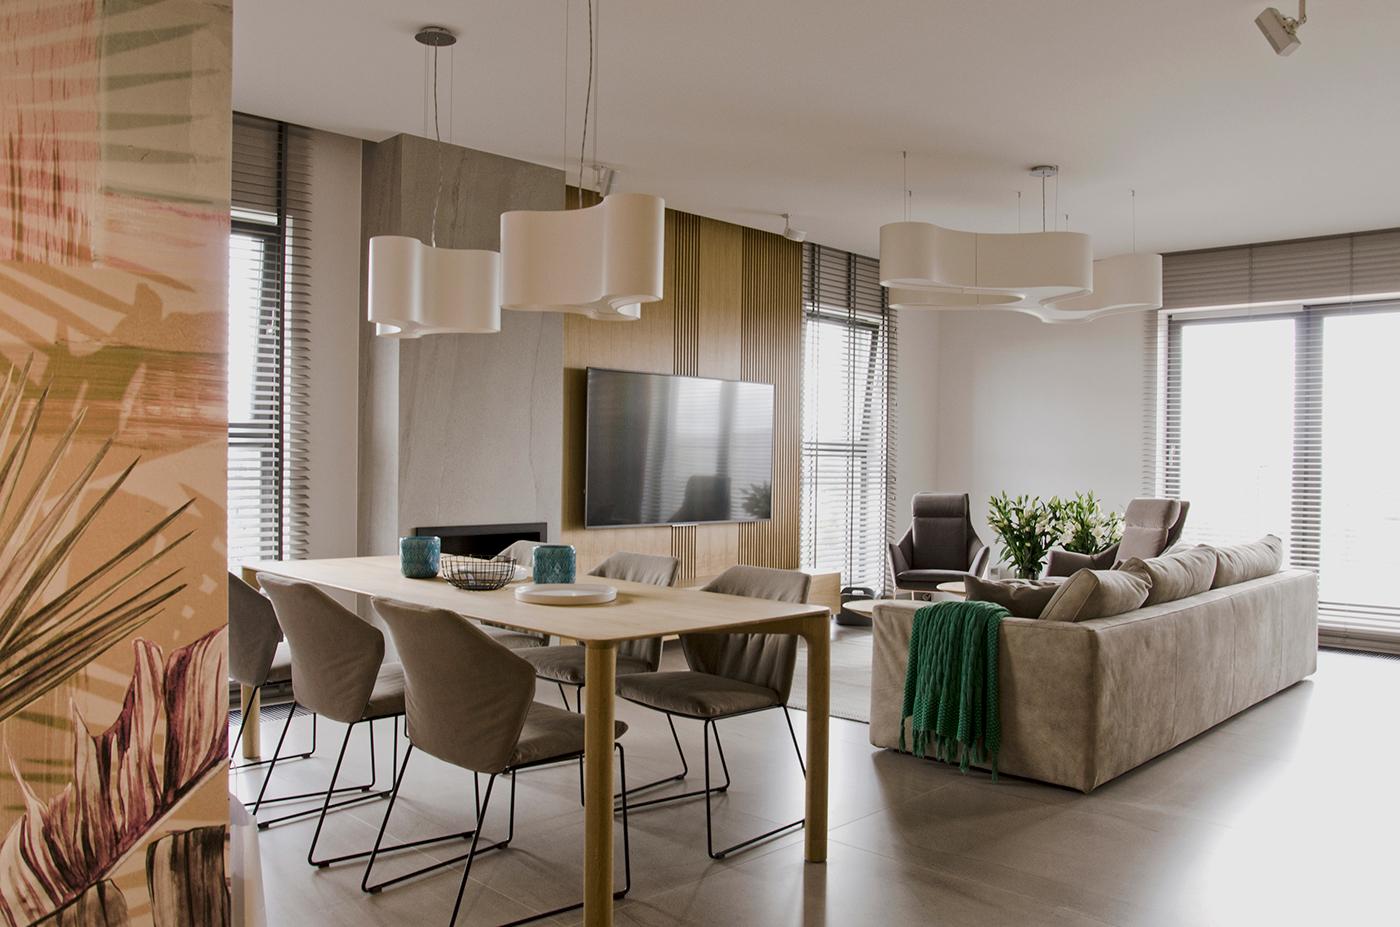 apartment in pastels 100m2 bydgoszcz poland on behance. Black Bedroom Furniture Sets. Home Design Ideas